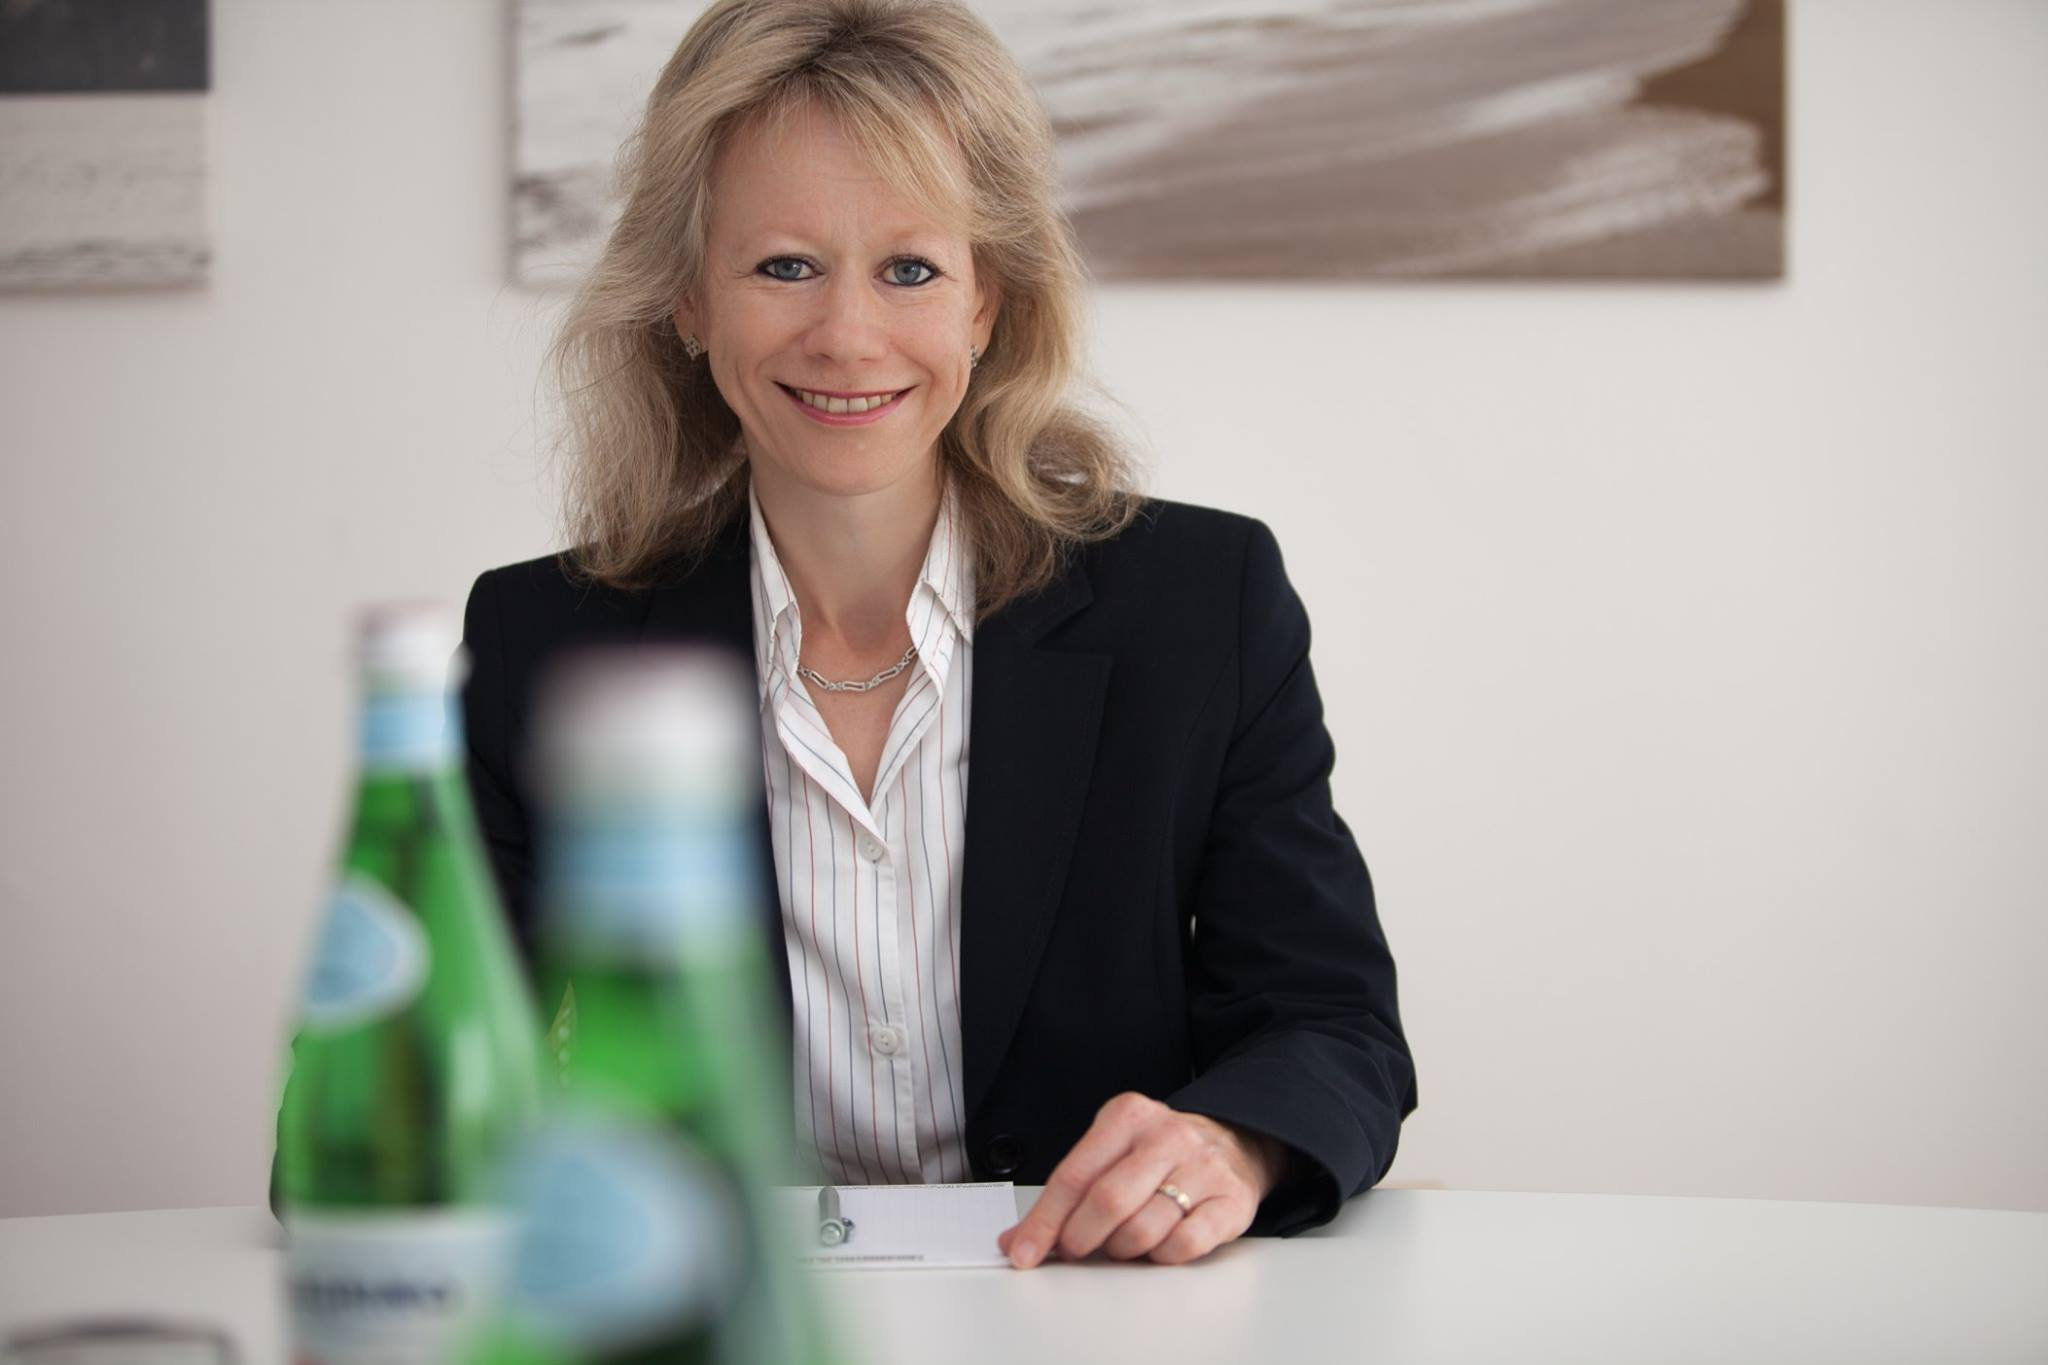 Rechtsanwältin Christiane Pohl